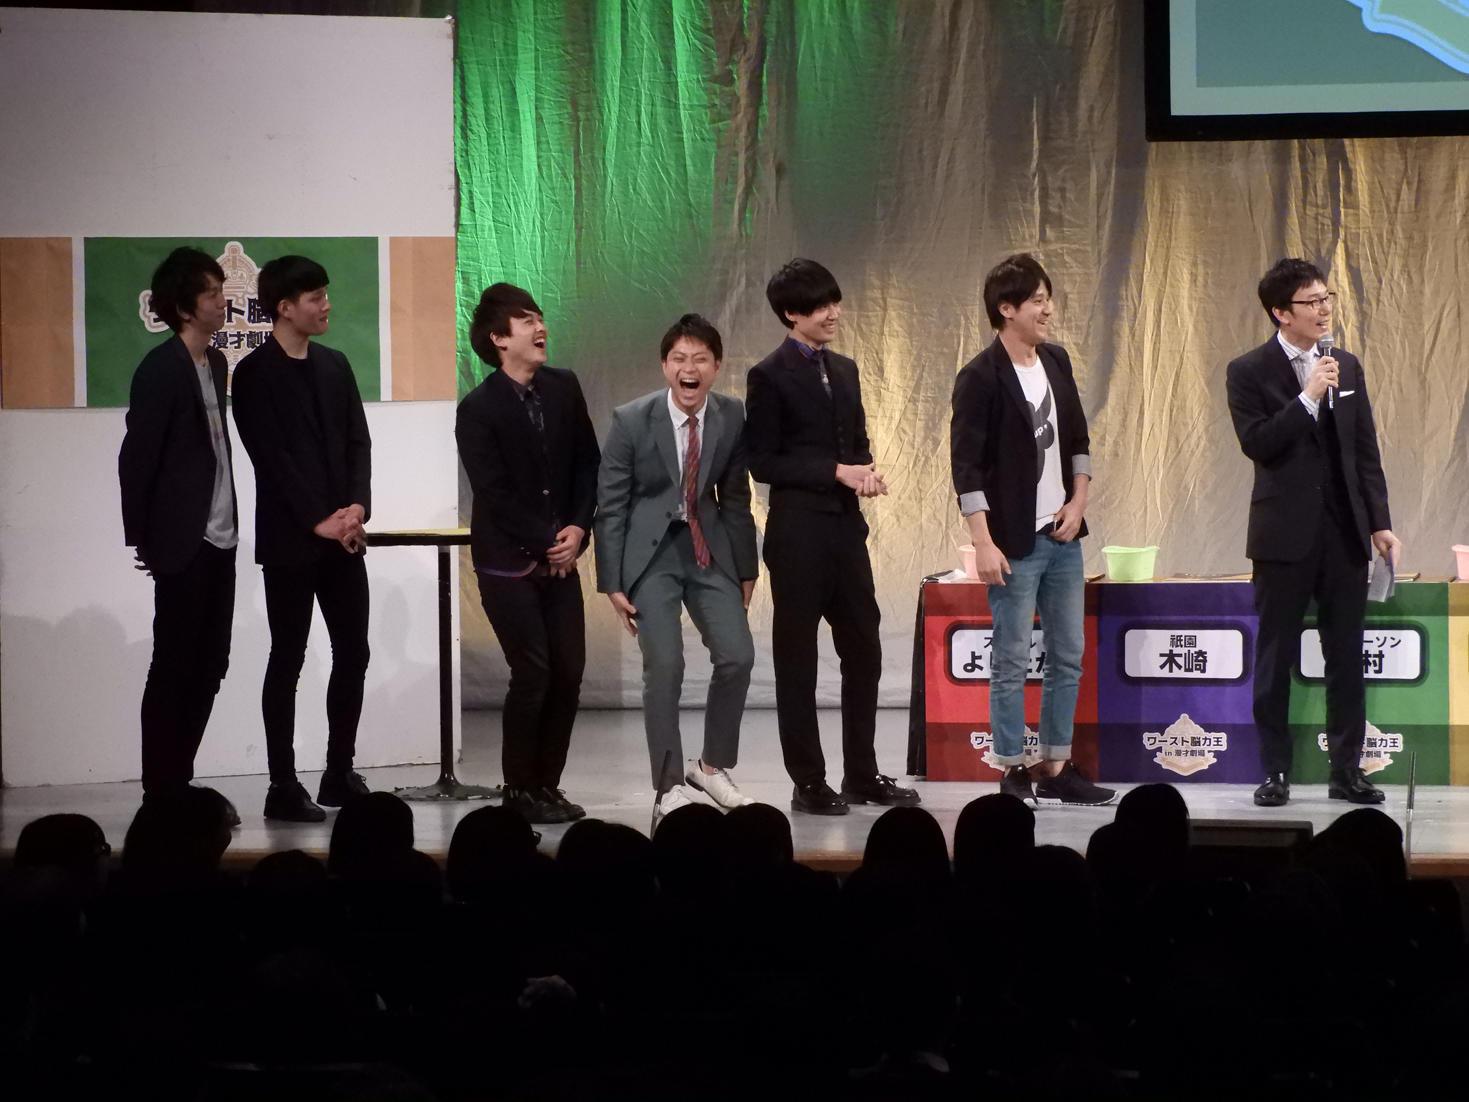 http://news.yoshimoto.co.jp/20180406111750-4acda7be399fa97a8df22bf0f45eaa5339bccc16.jpg